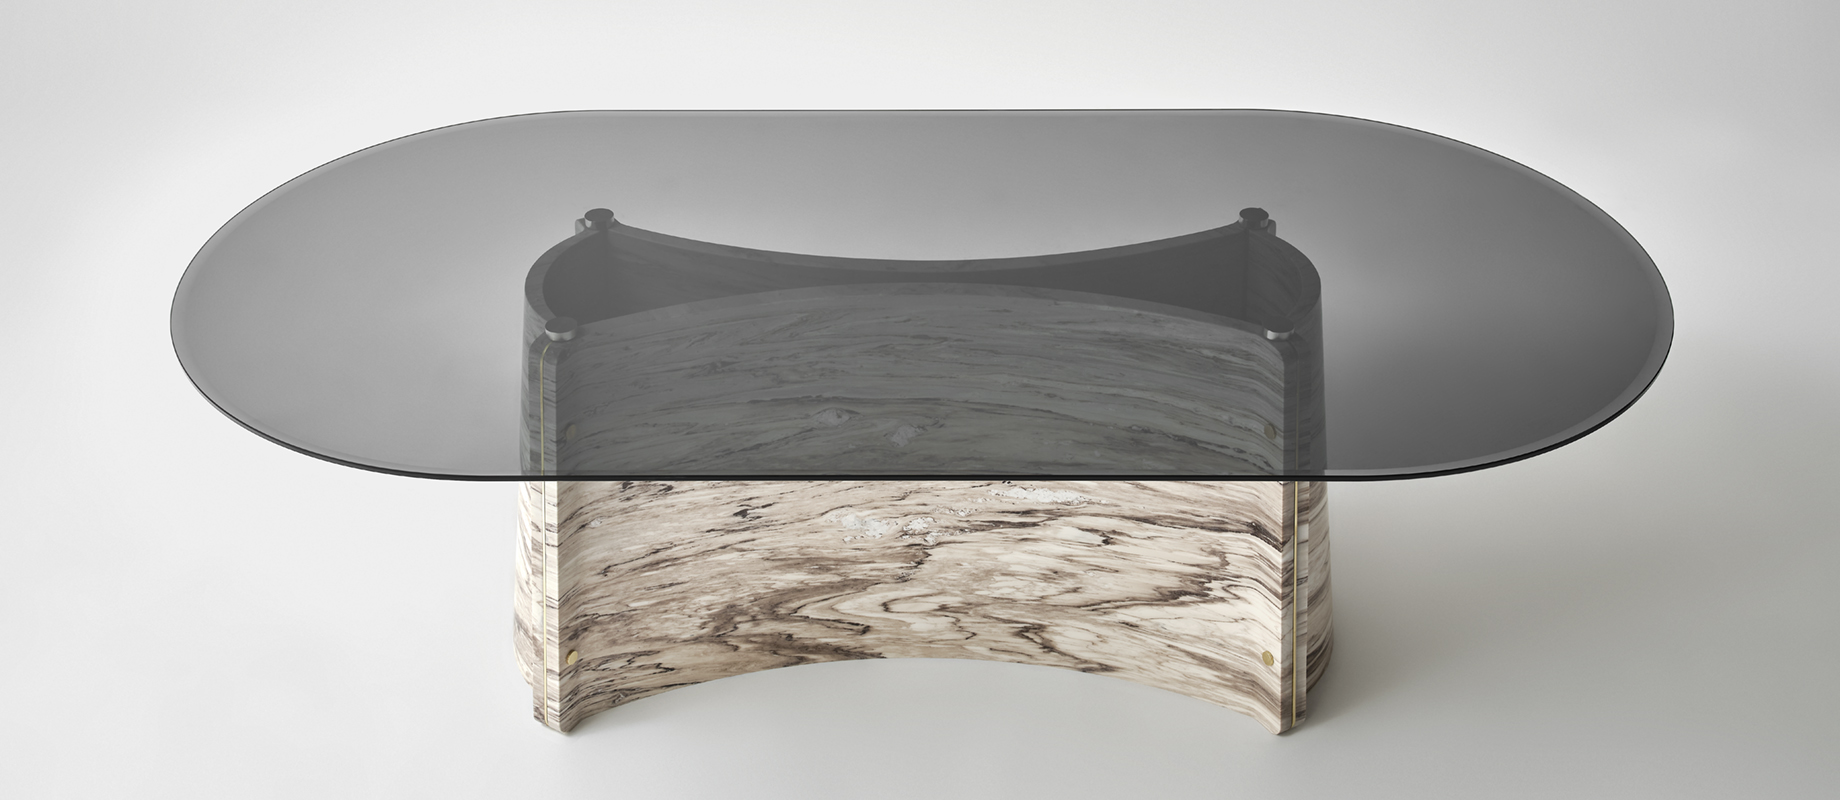 LithosDesign_ElitraXL_palissandro_brown_designer_dining_tables_slider